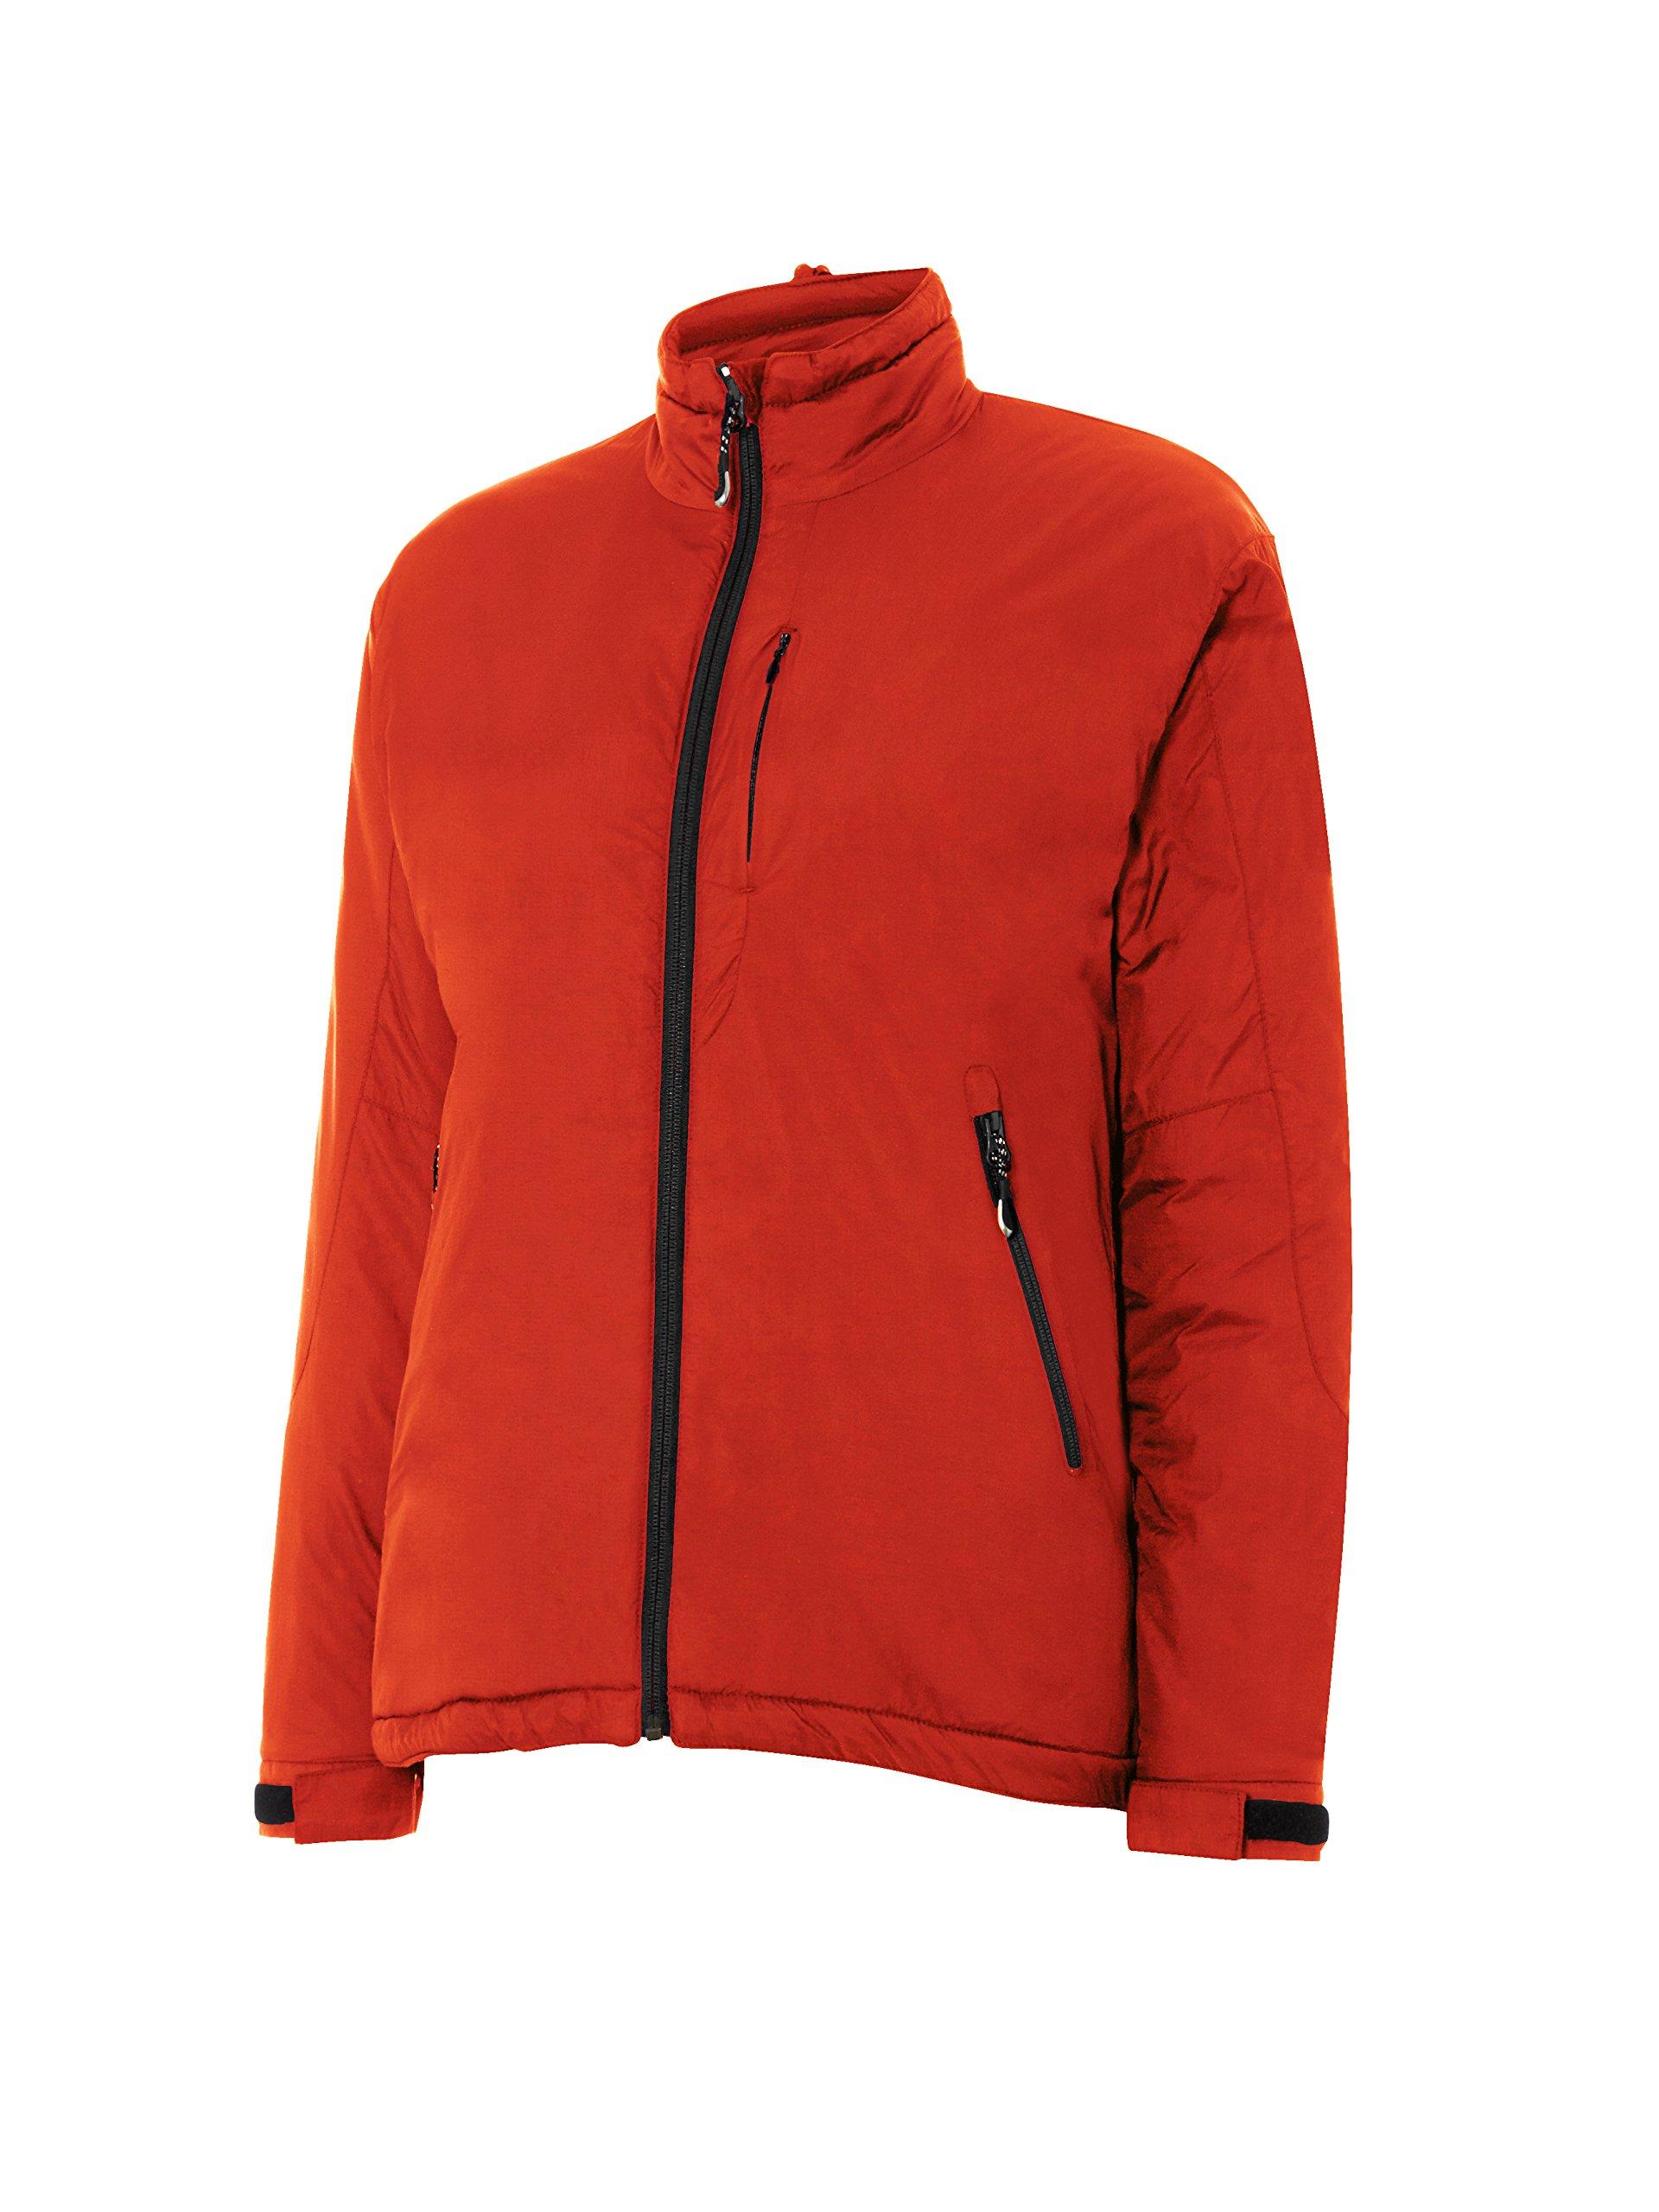 81kqXxI%2BhKL - Keela Women's Belay Pro Jacket